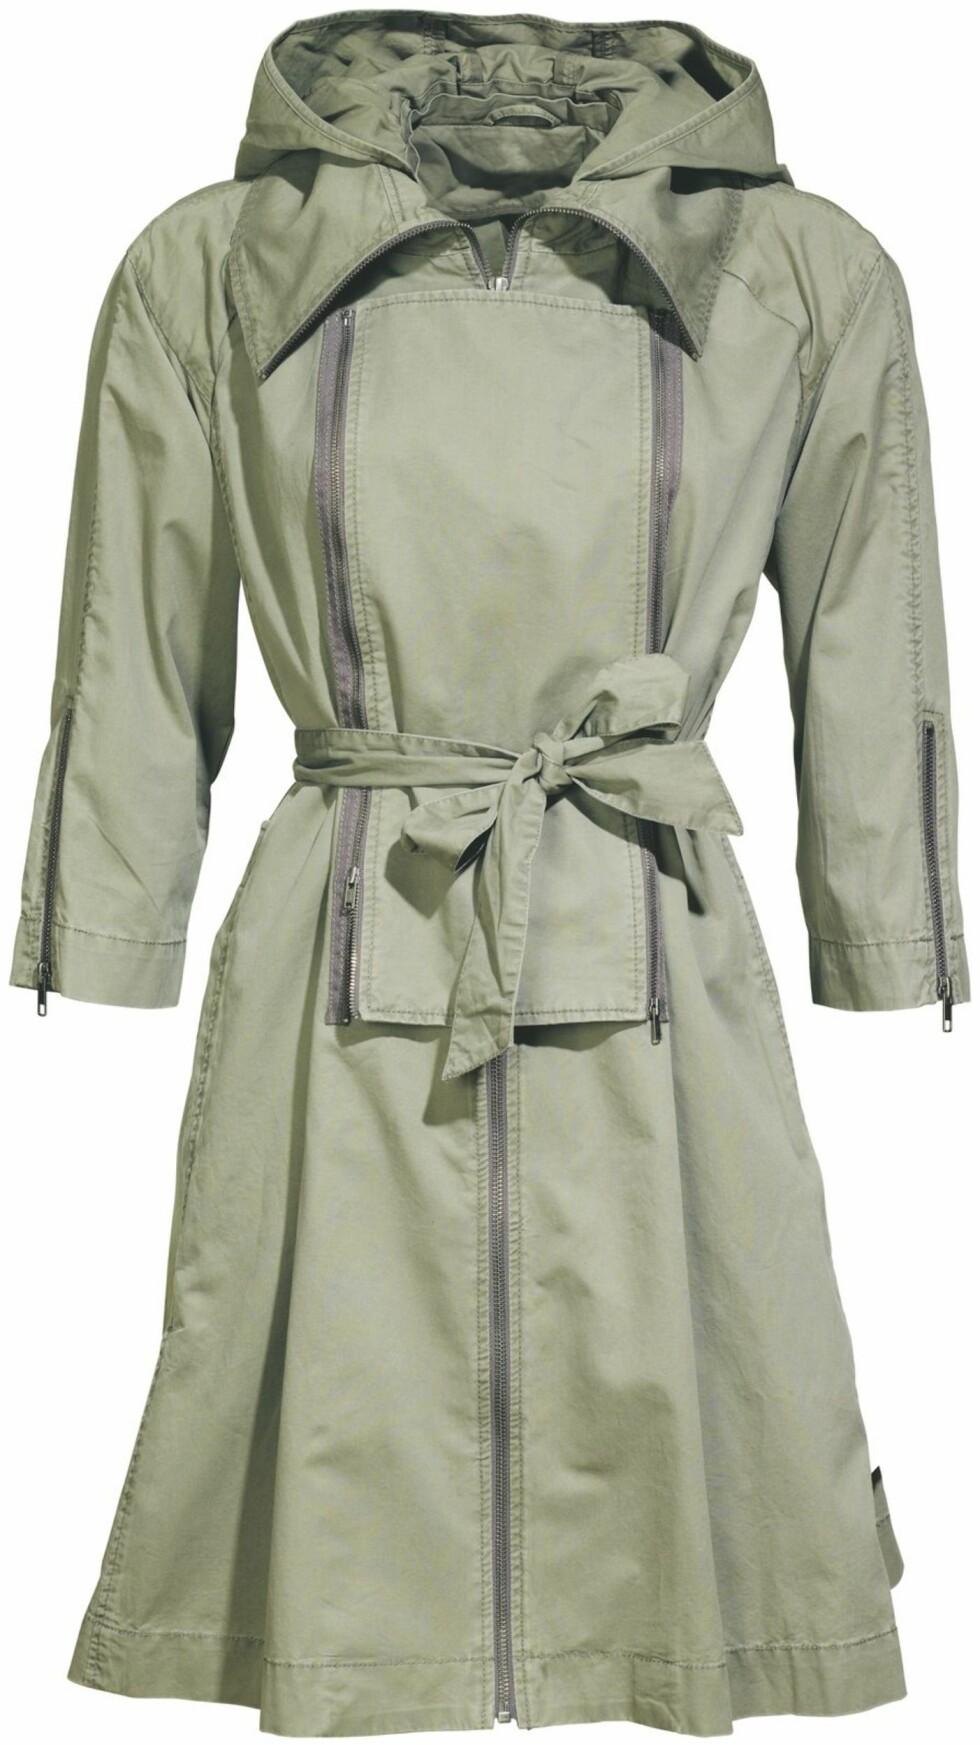 Olivengrønn trenchcoat (kr 700, H&M).